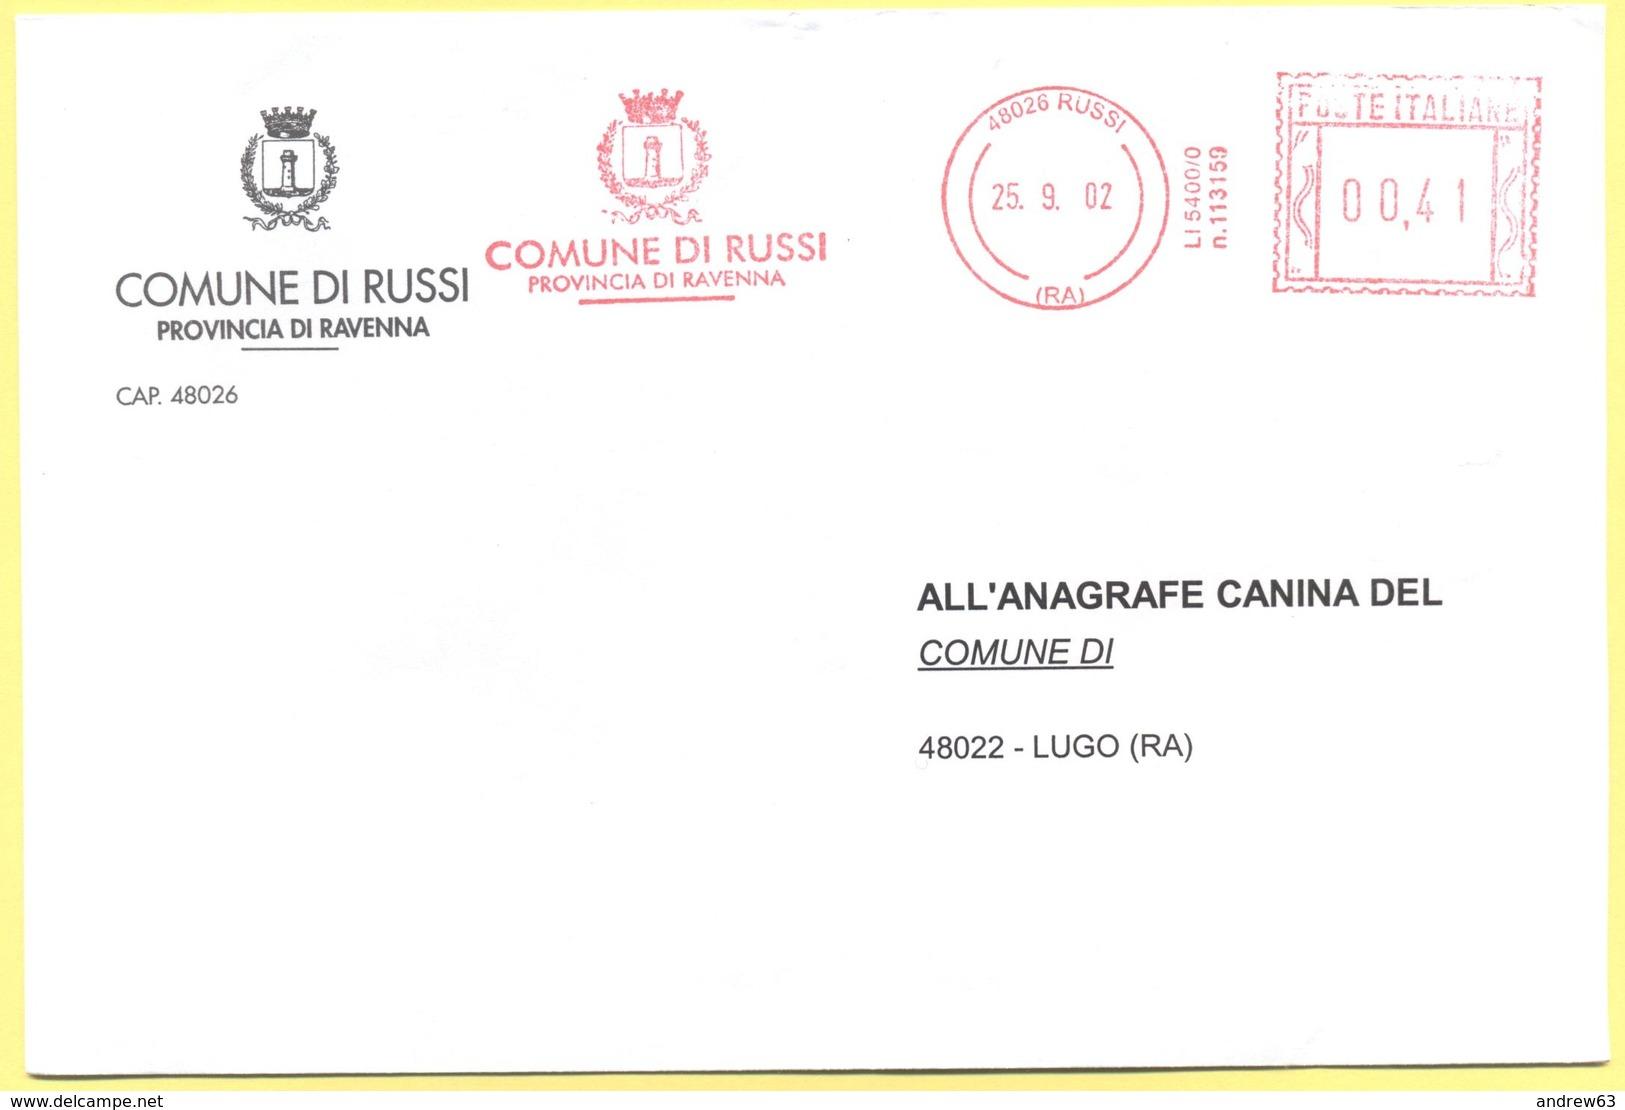 ITALIA - ITALY - ITALIE - 2002 - 00,41 EMA, Red Cancel - Comune Di Russi - Viaggiata Da Russi Per Lugo - Affrancature Meccaniche Rosse (EMA)